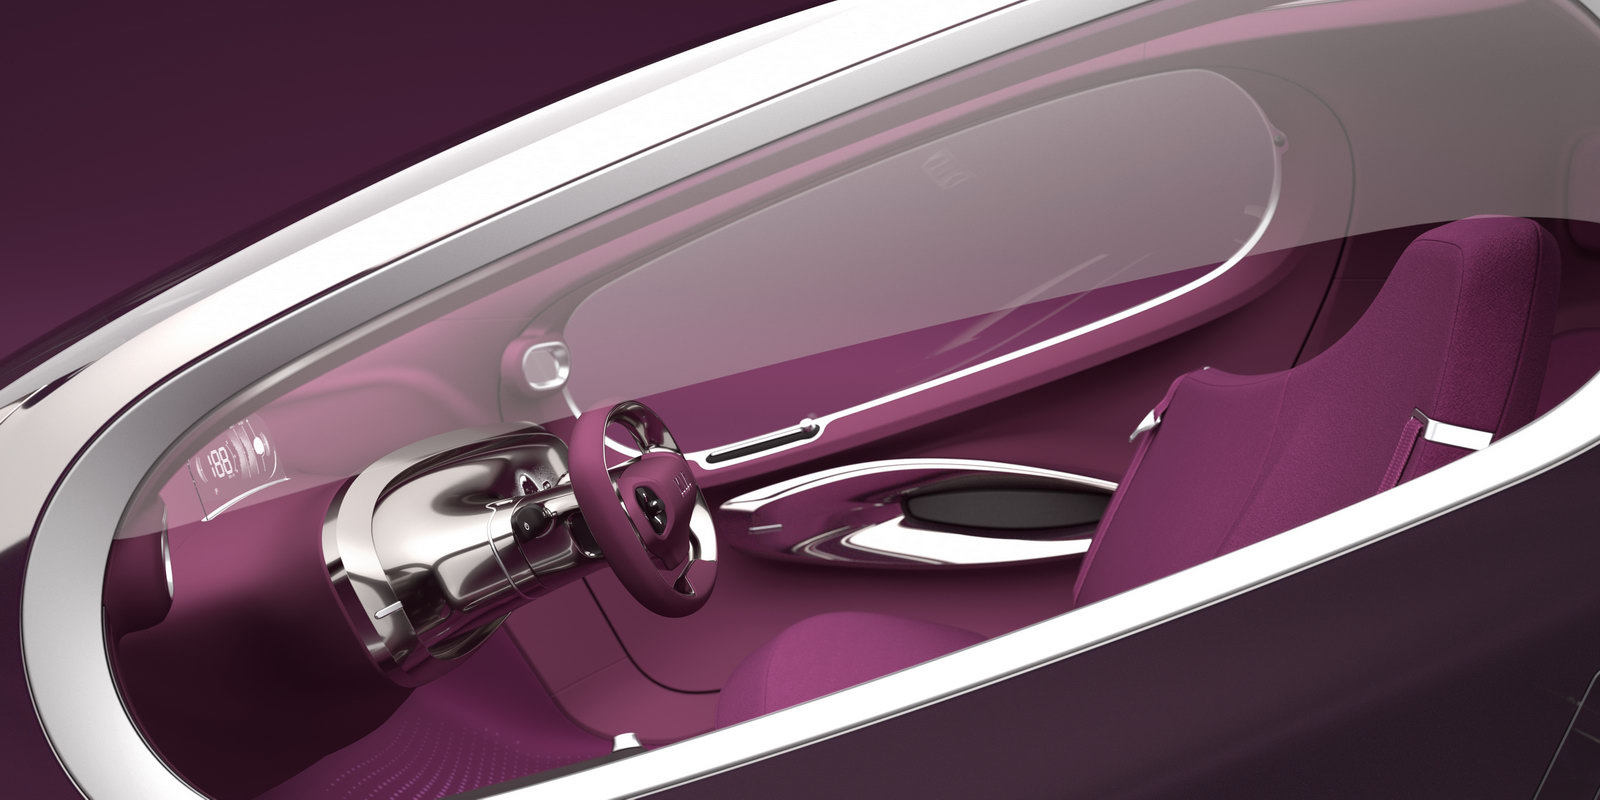 kia_pop_electric_vehicle_concept_10